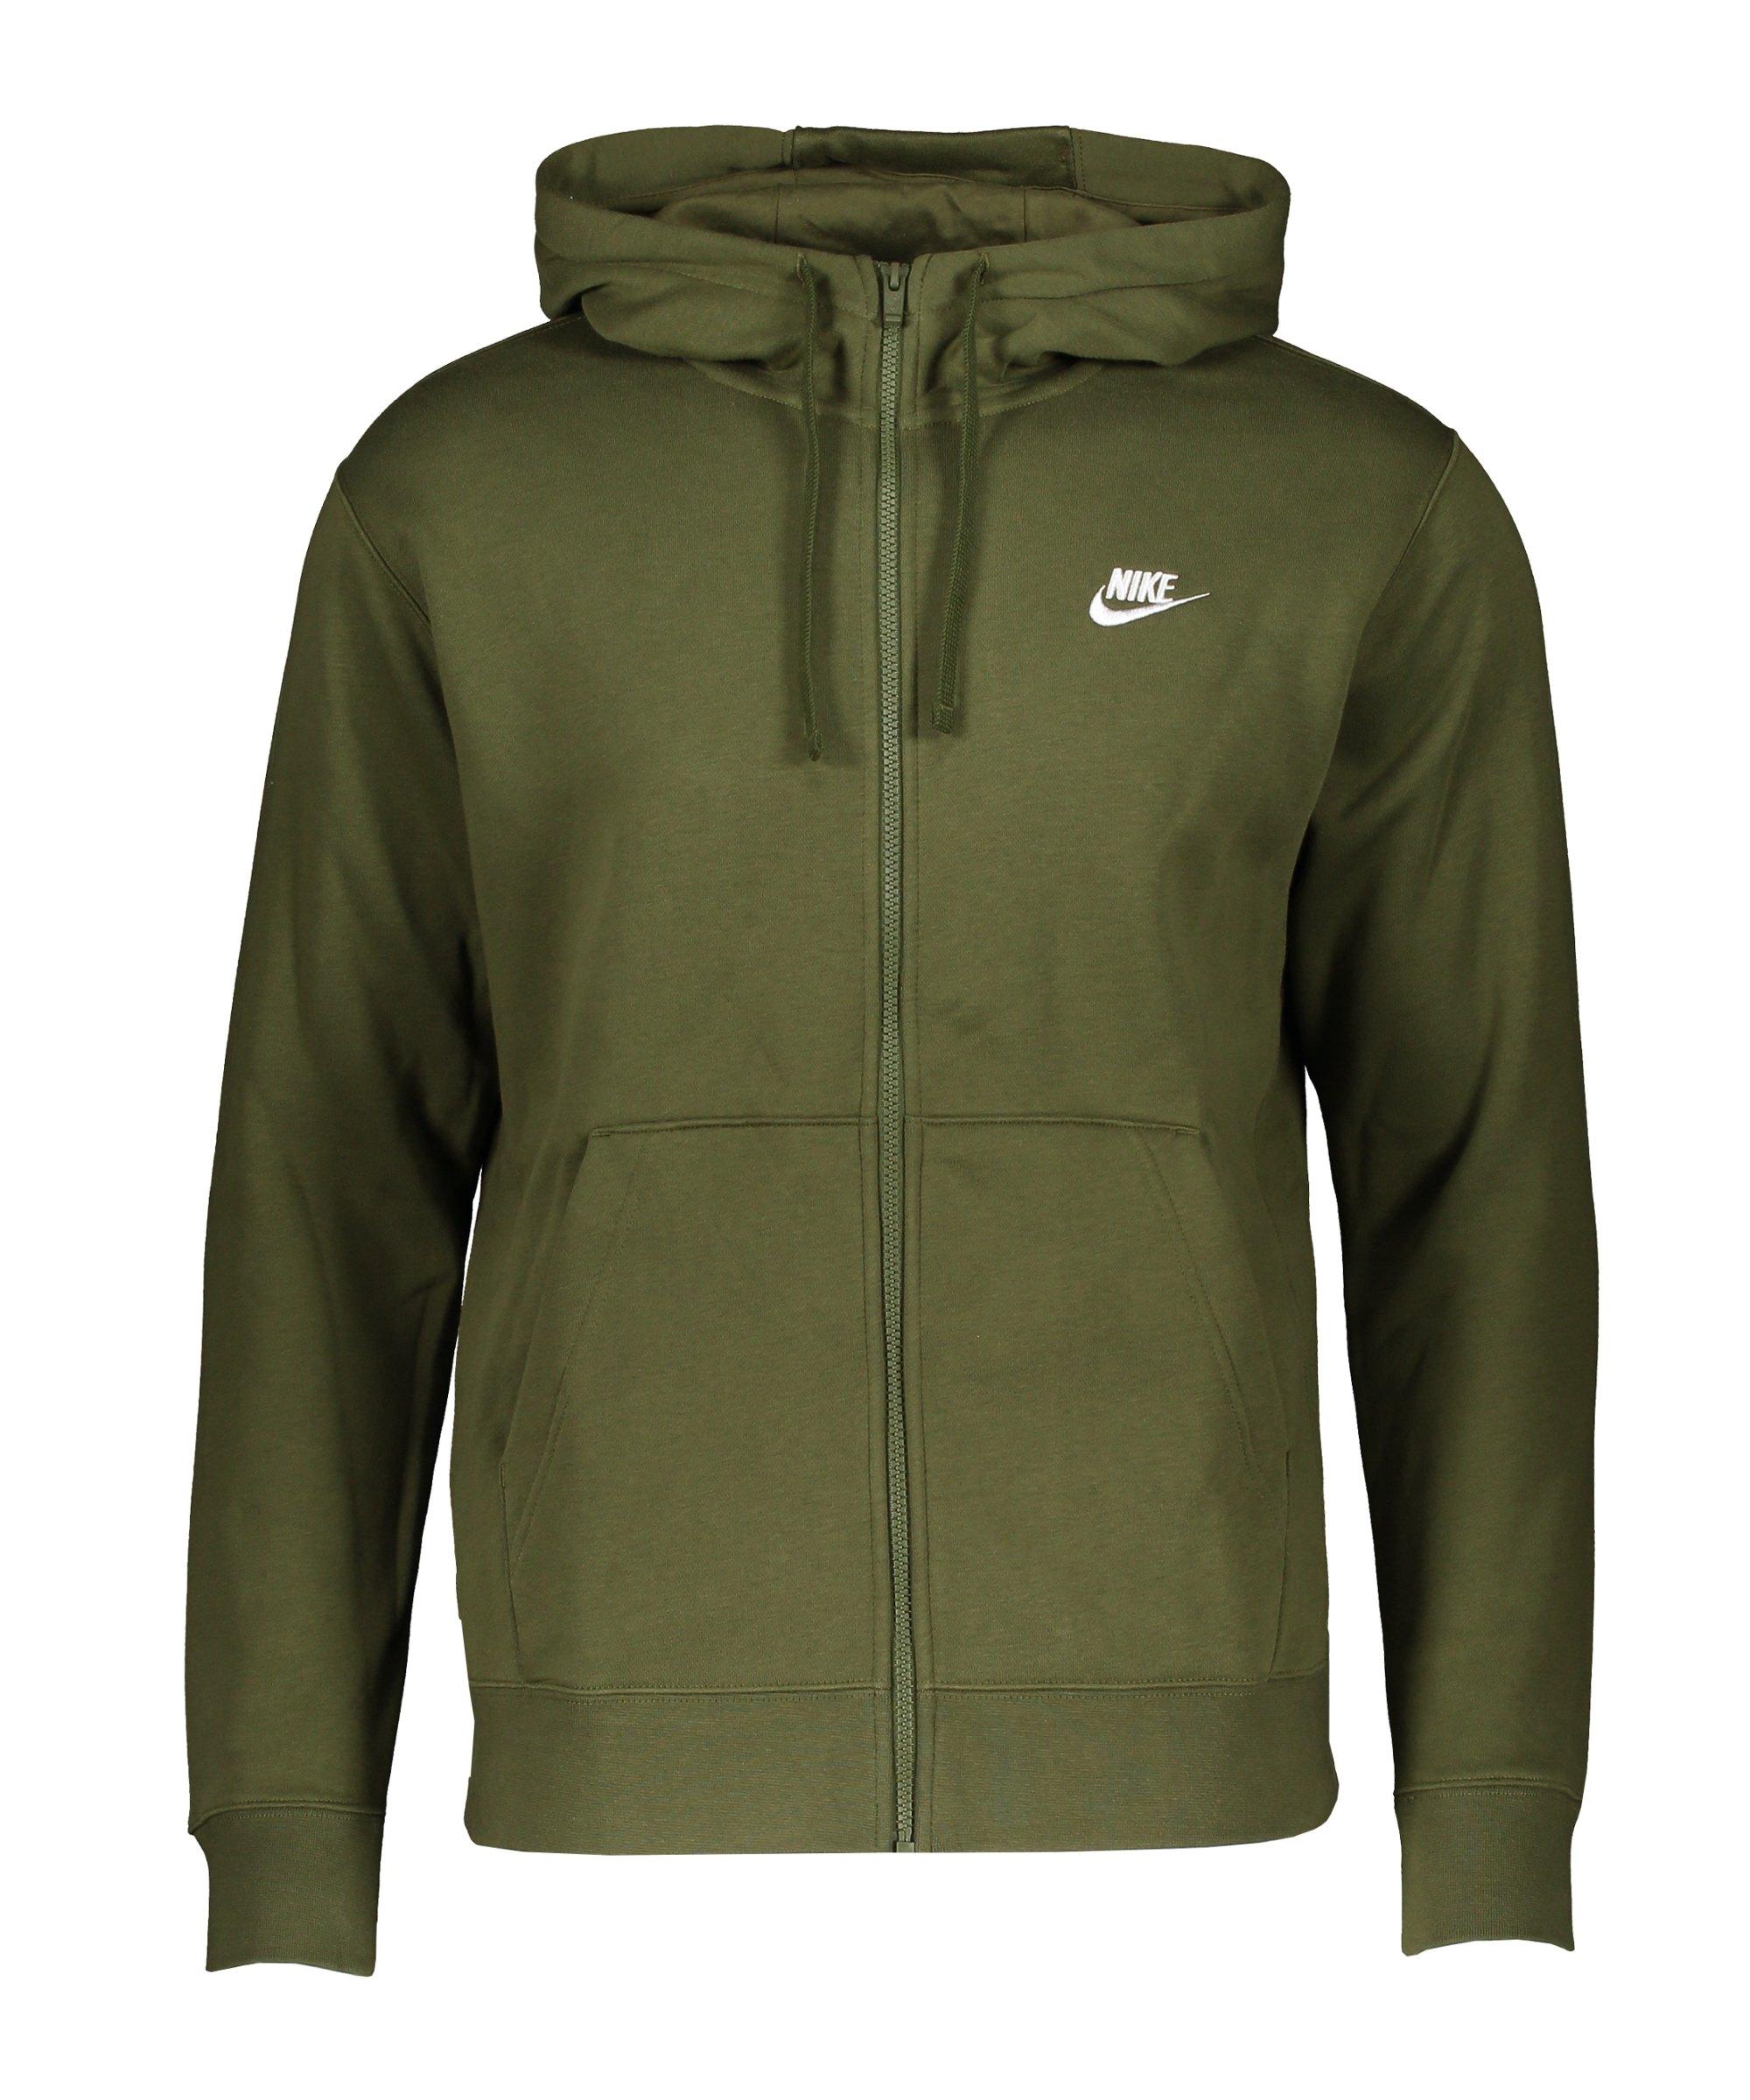 Nike Club Fleece Kapuzenjacke Grün Weiss F327 - gruen